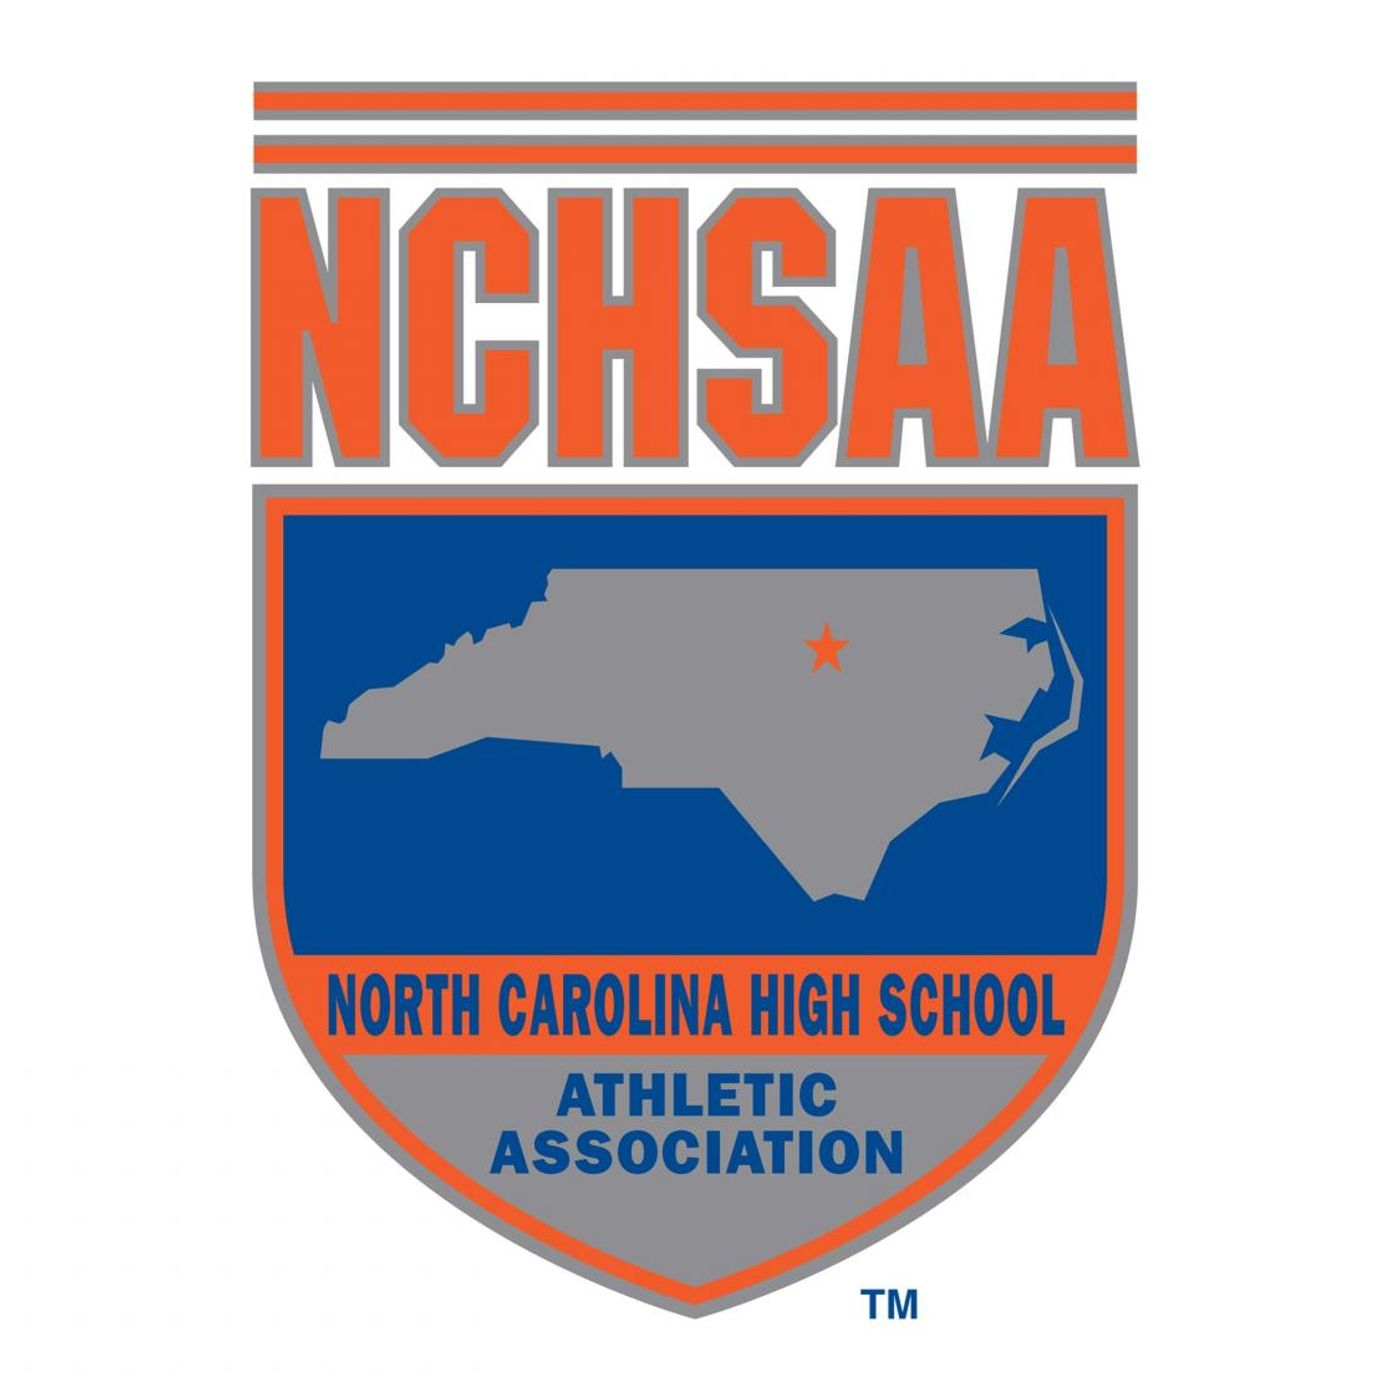 NCHSAA Round #1 Women's State Basketball Playoffs, Clayton Comets vs Swansboro Pirates from Swansboro, NC! #WeAreCRN #cometsALLin